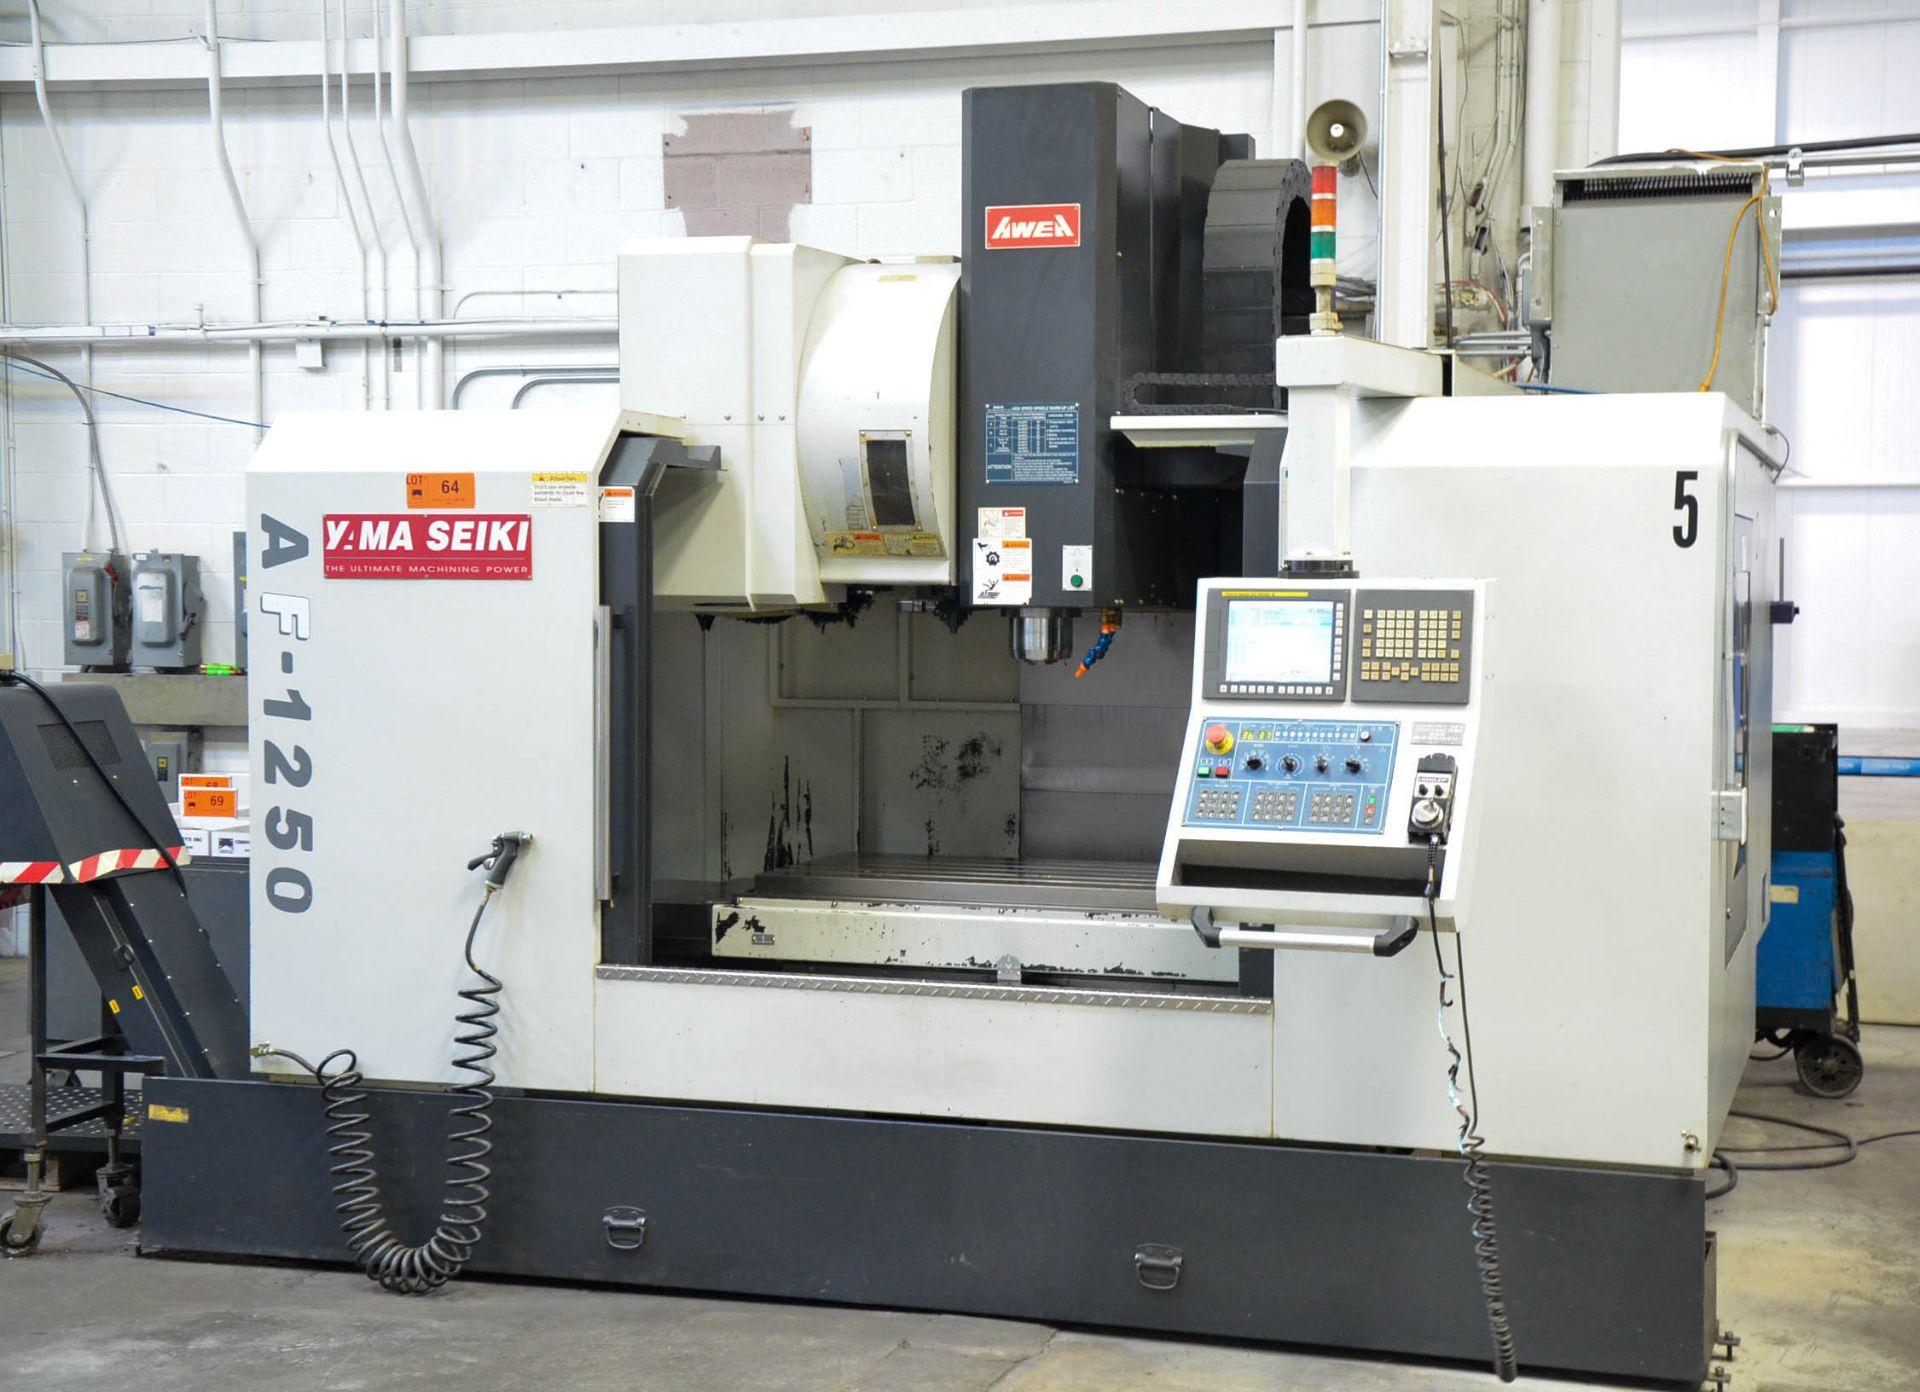 AWEA YAMA SEIKI (2012) AF-1250 CNC VERTICAL MACHINING CENTER WITH FANUC SERIES 31I-MODEL B CNC